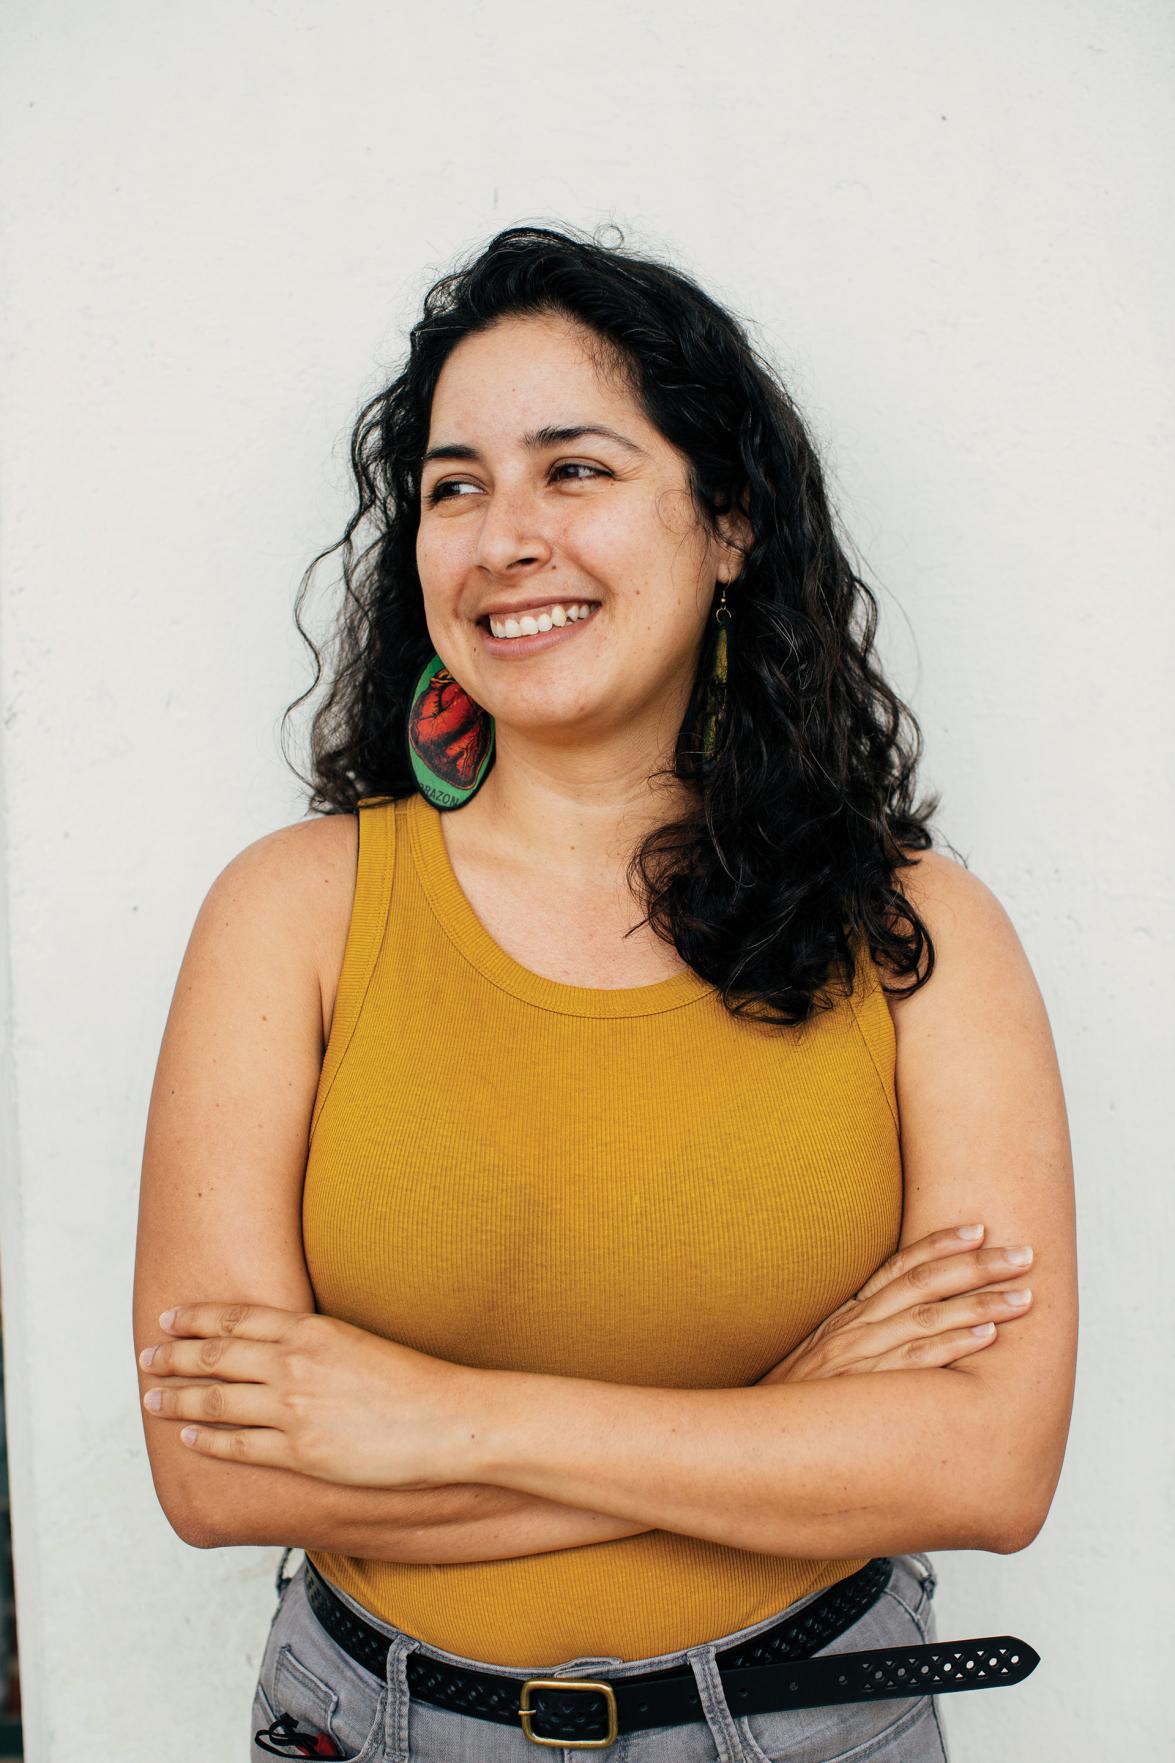 The People Issue 2021: Transit Advocate Brenda Pérez